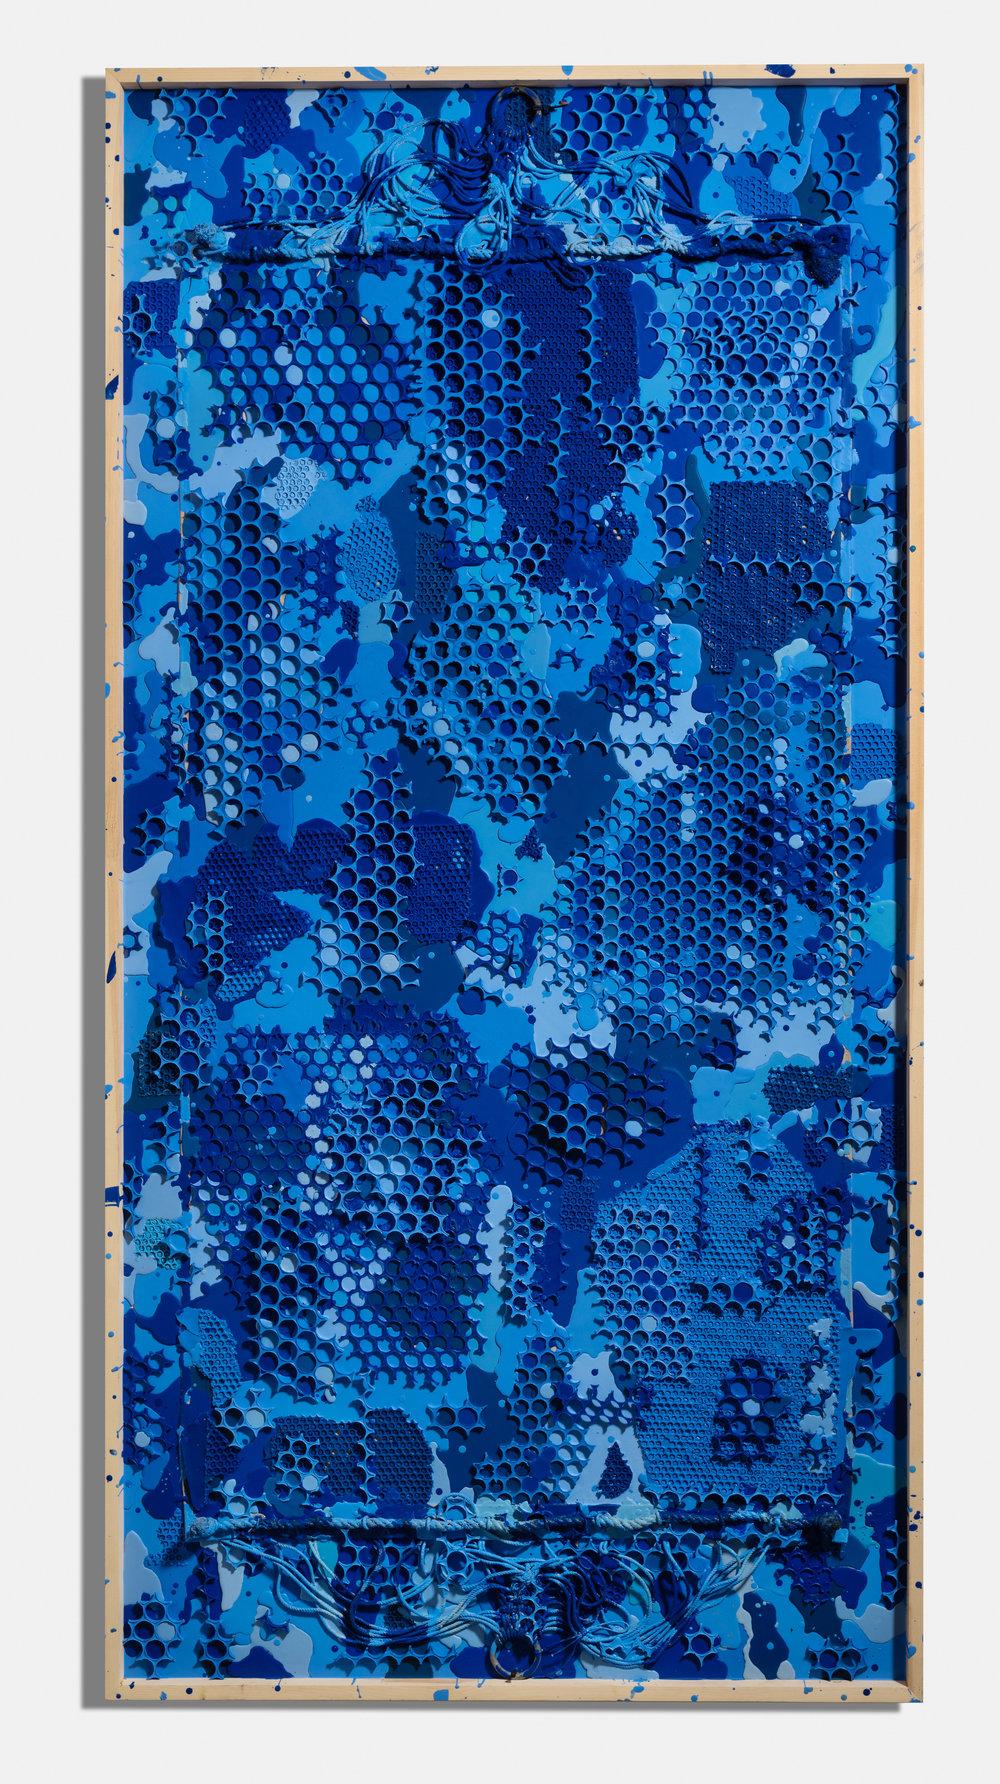 Razzle Dazzle,  2017, encaustic and hammock on panel, 96 x 48 x 3 1/2 inches